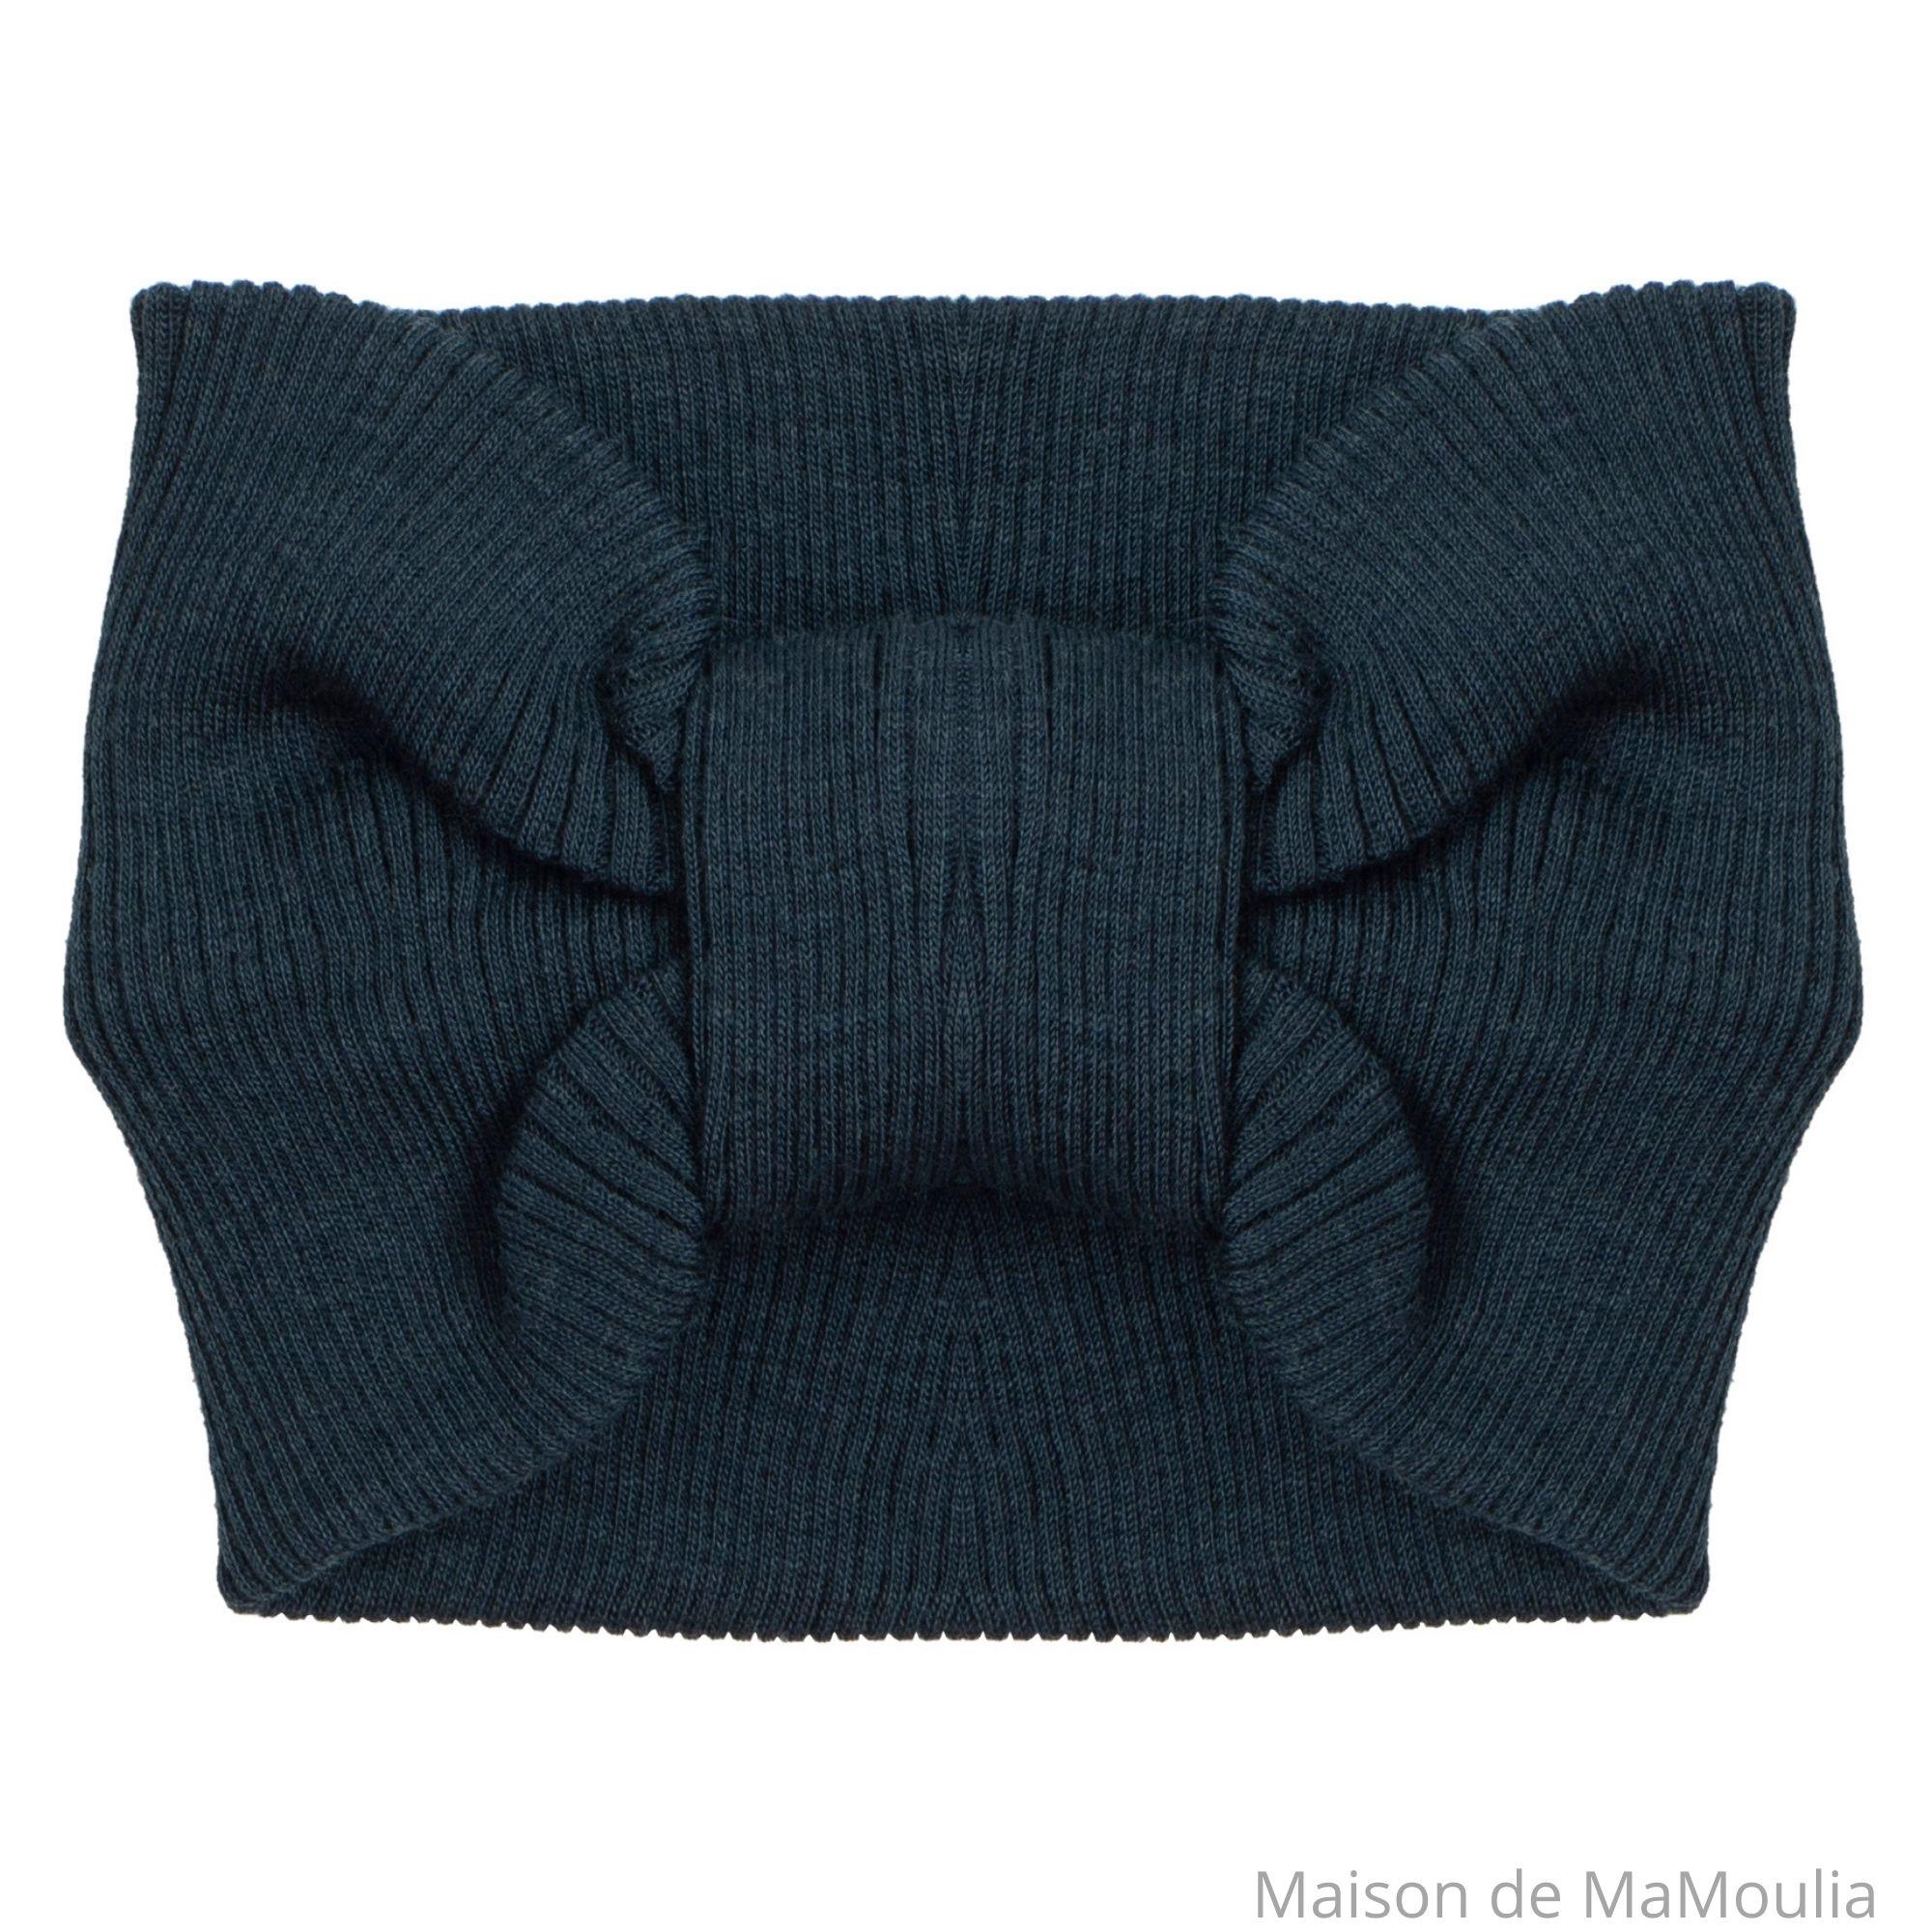 headband-bandeau-serre-tete-femme-pure-laine-merinos-minimalisma-maison-de-mamoulia-navy-bleu